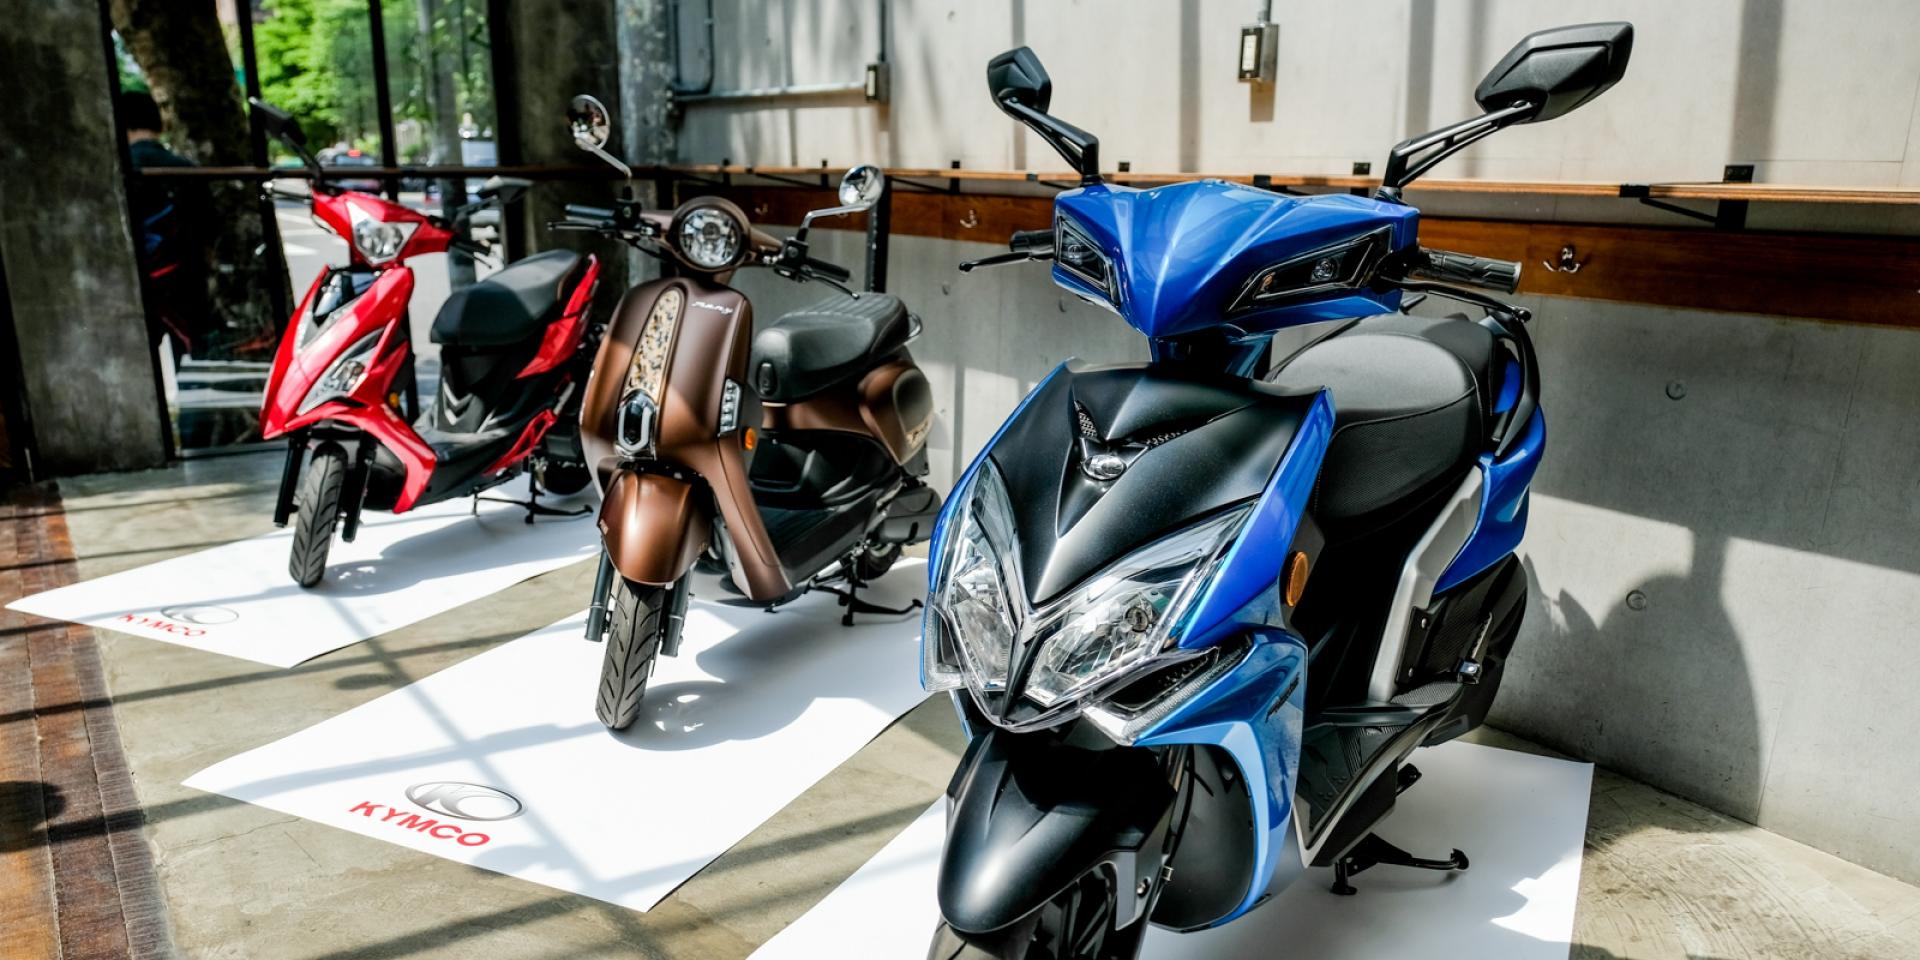 Racing S、GP 125、新名流125,ABS暑期新優惠,最低五萬有找騎回家